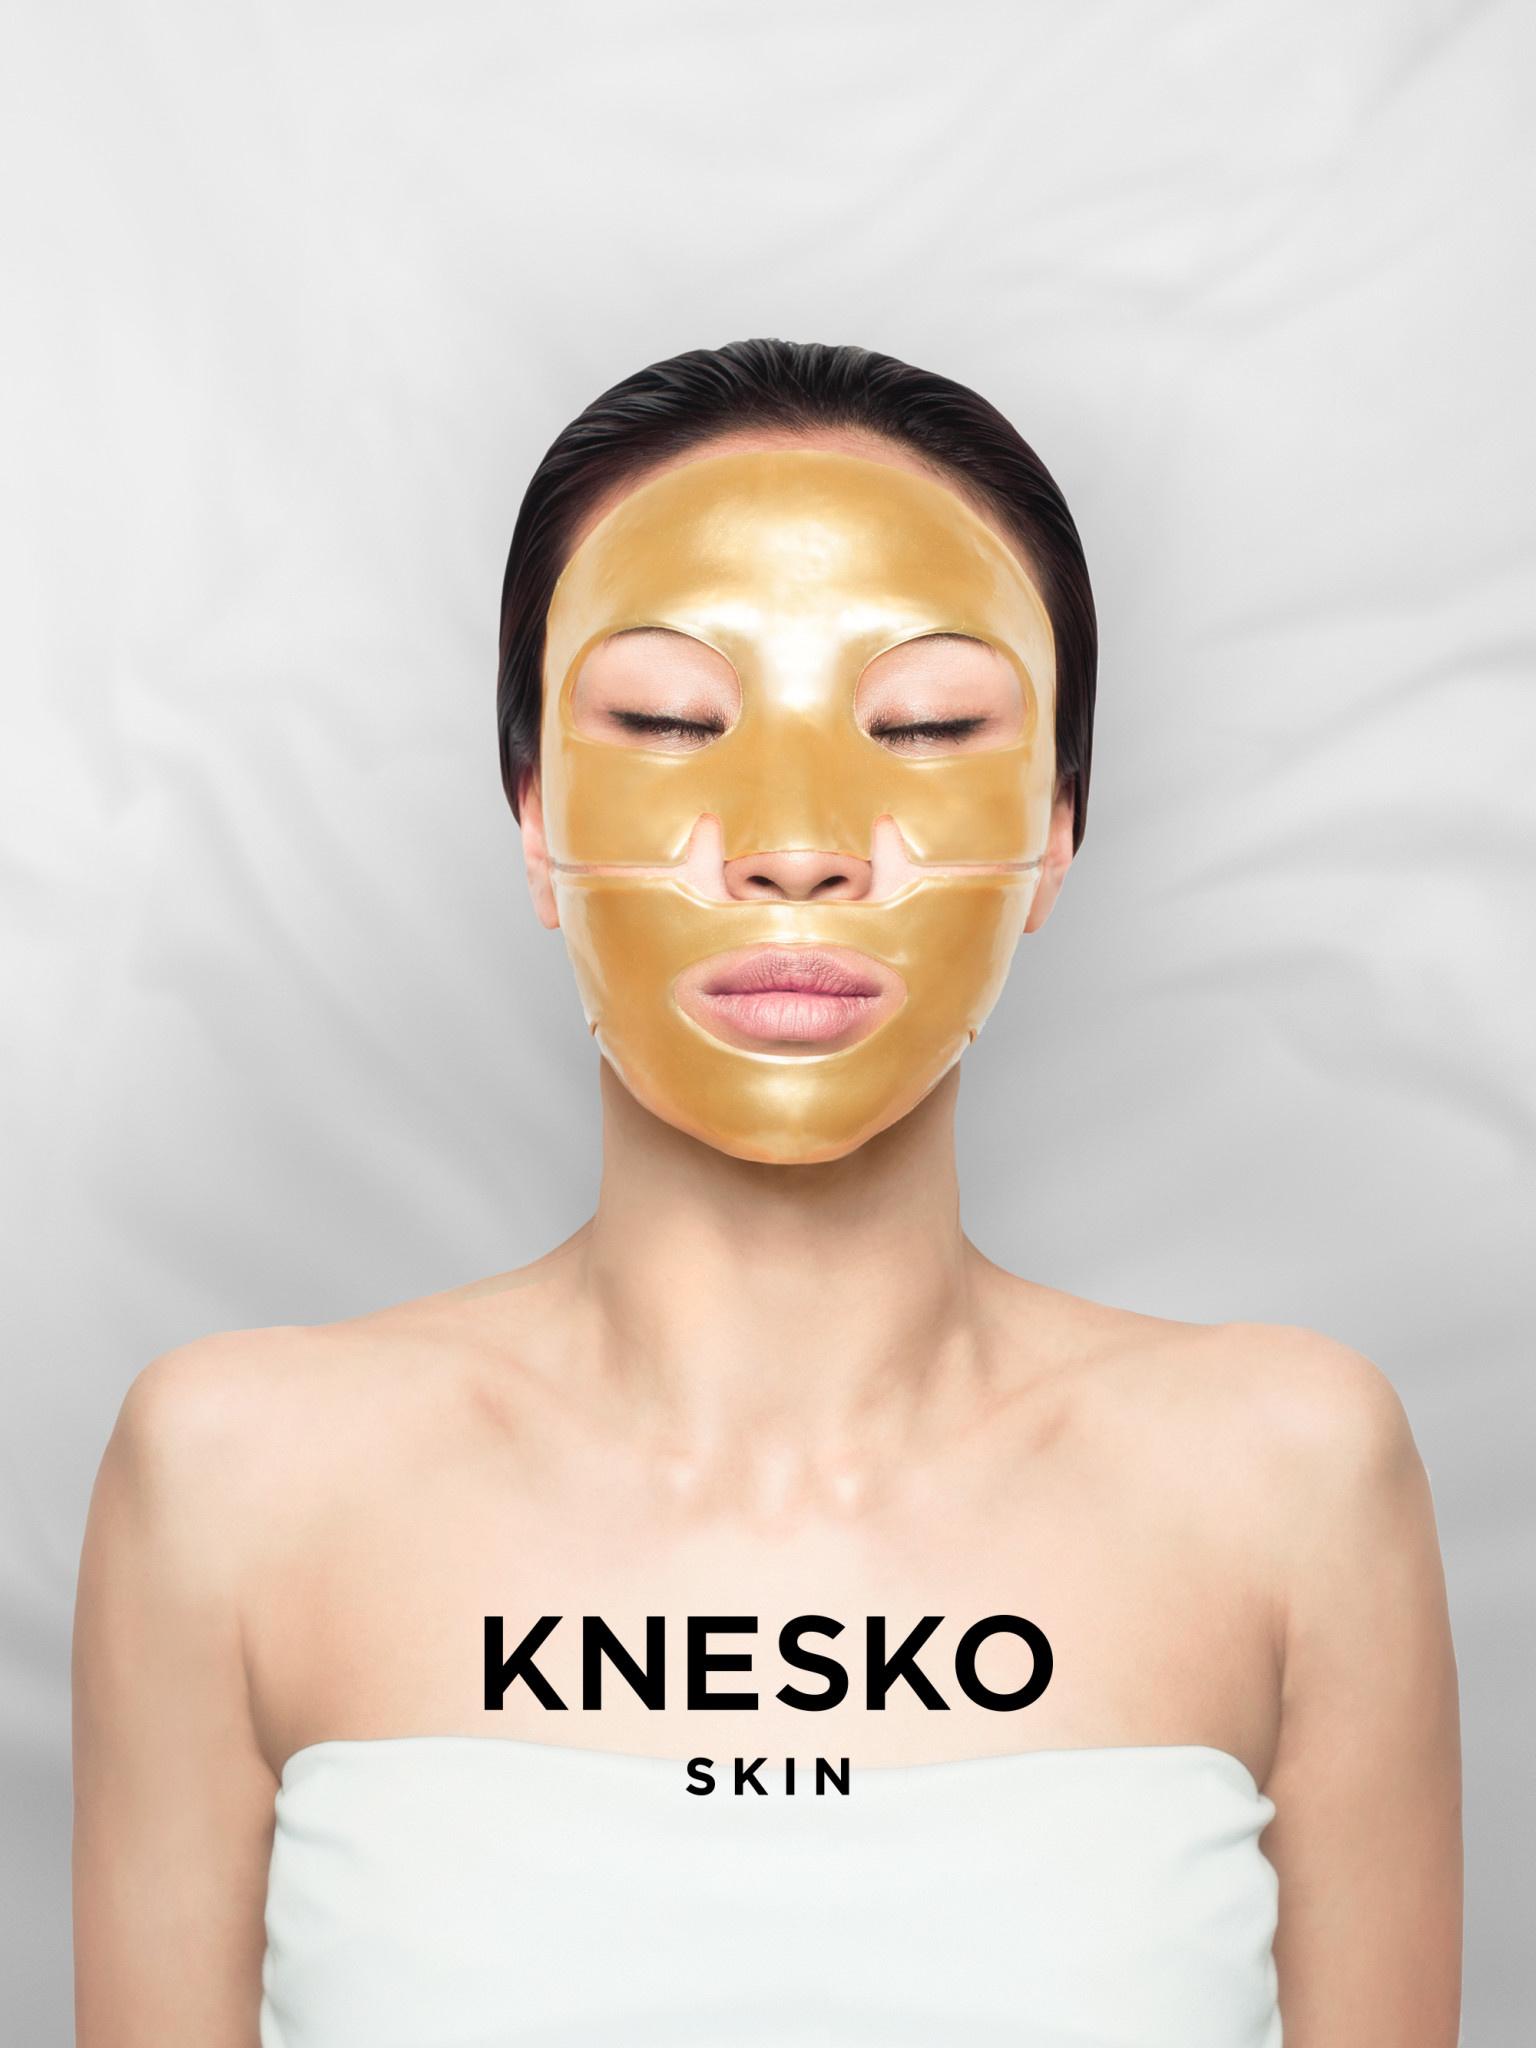 Knesko KNESKO SKIN: Masque Visage Réparation Nano'or/ Nanogold